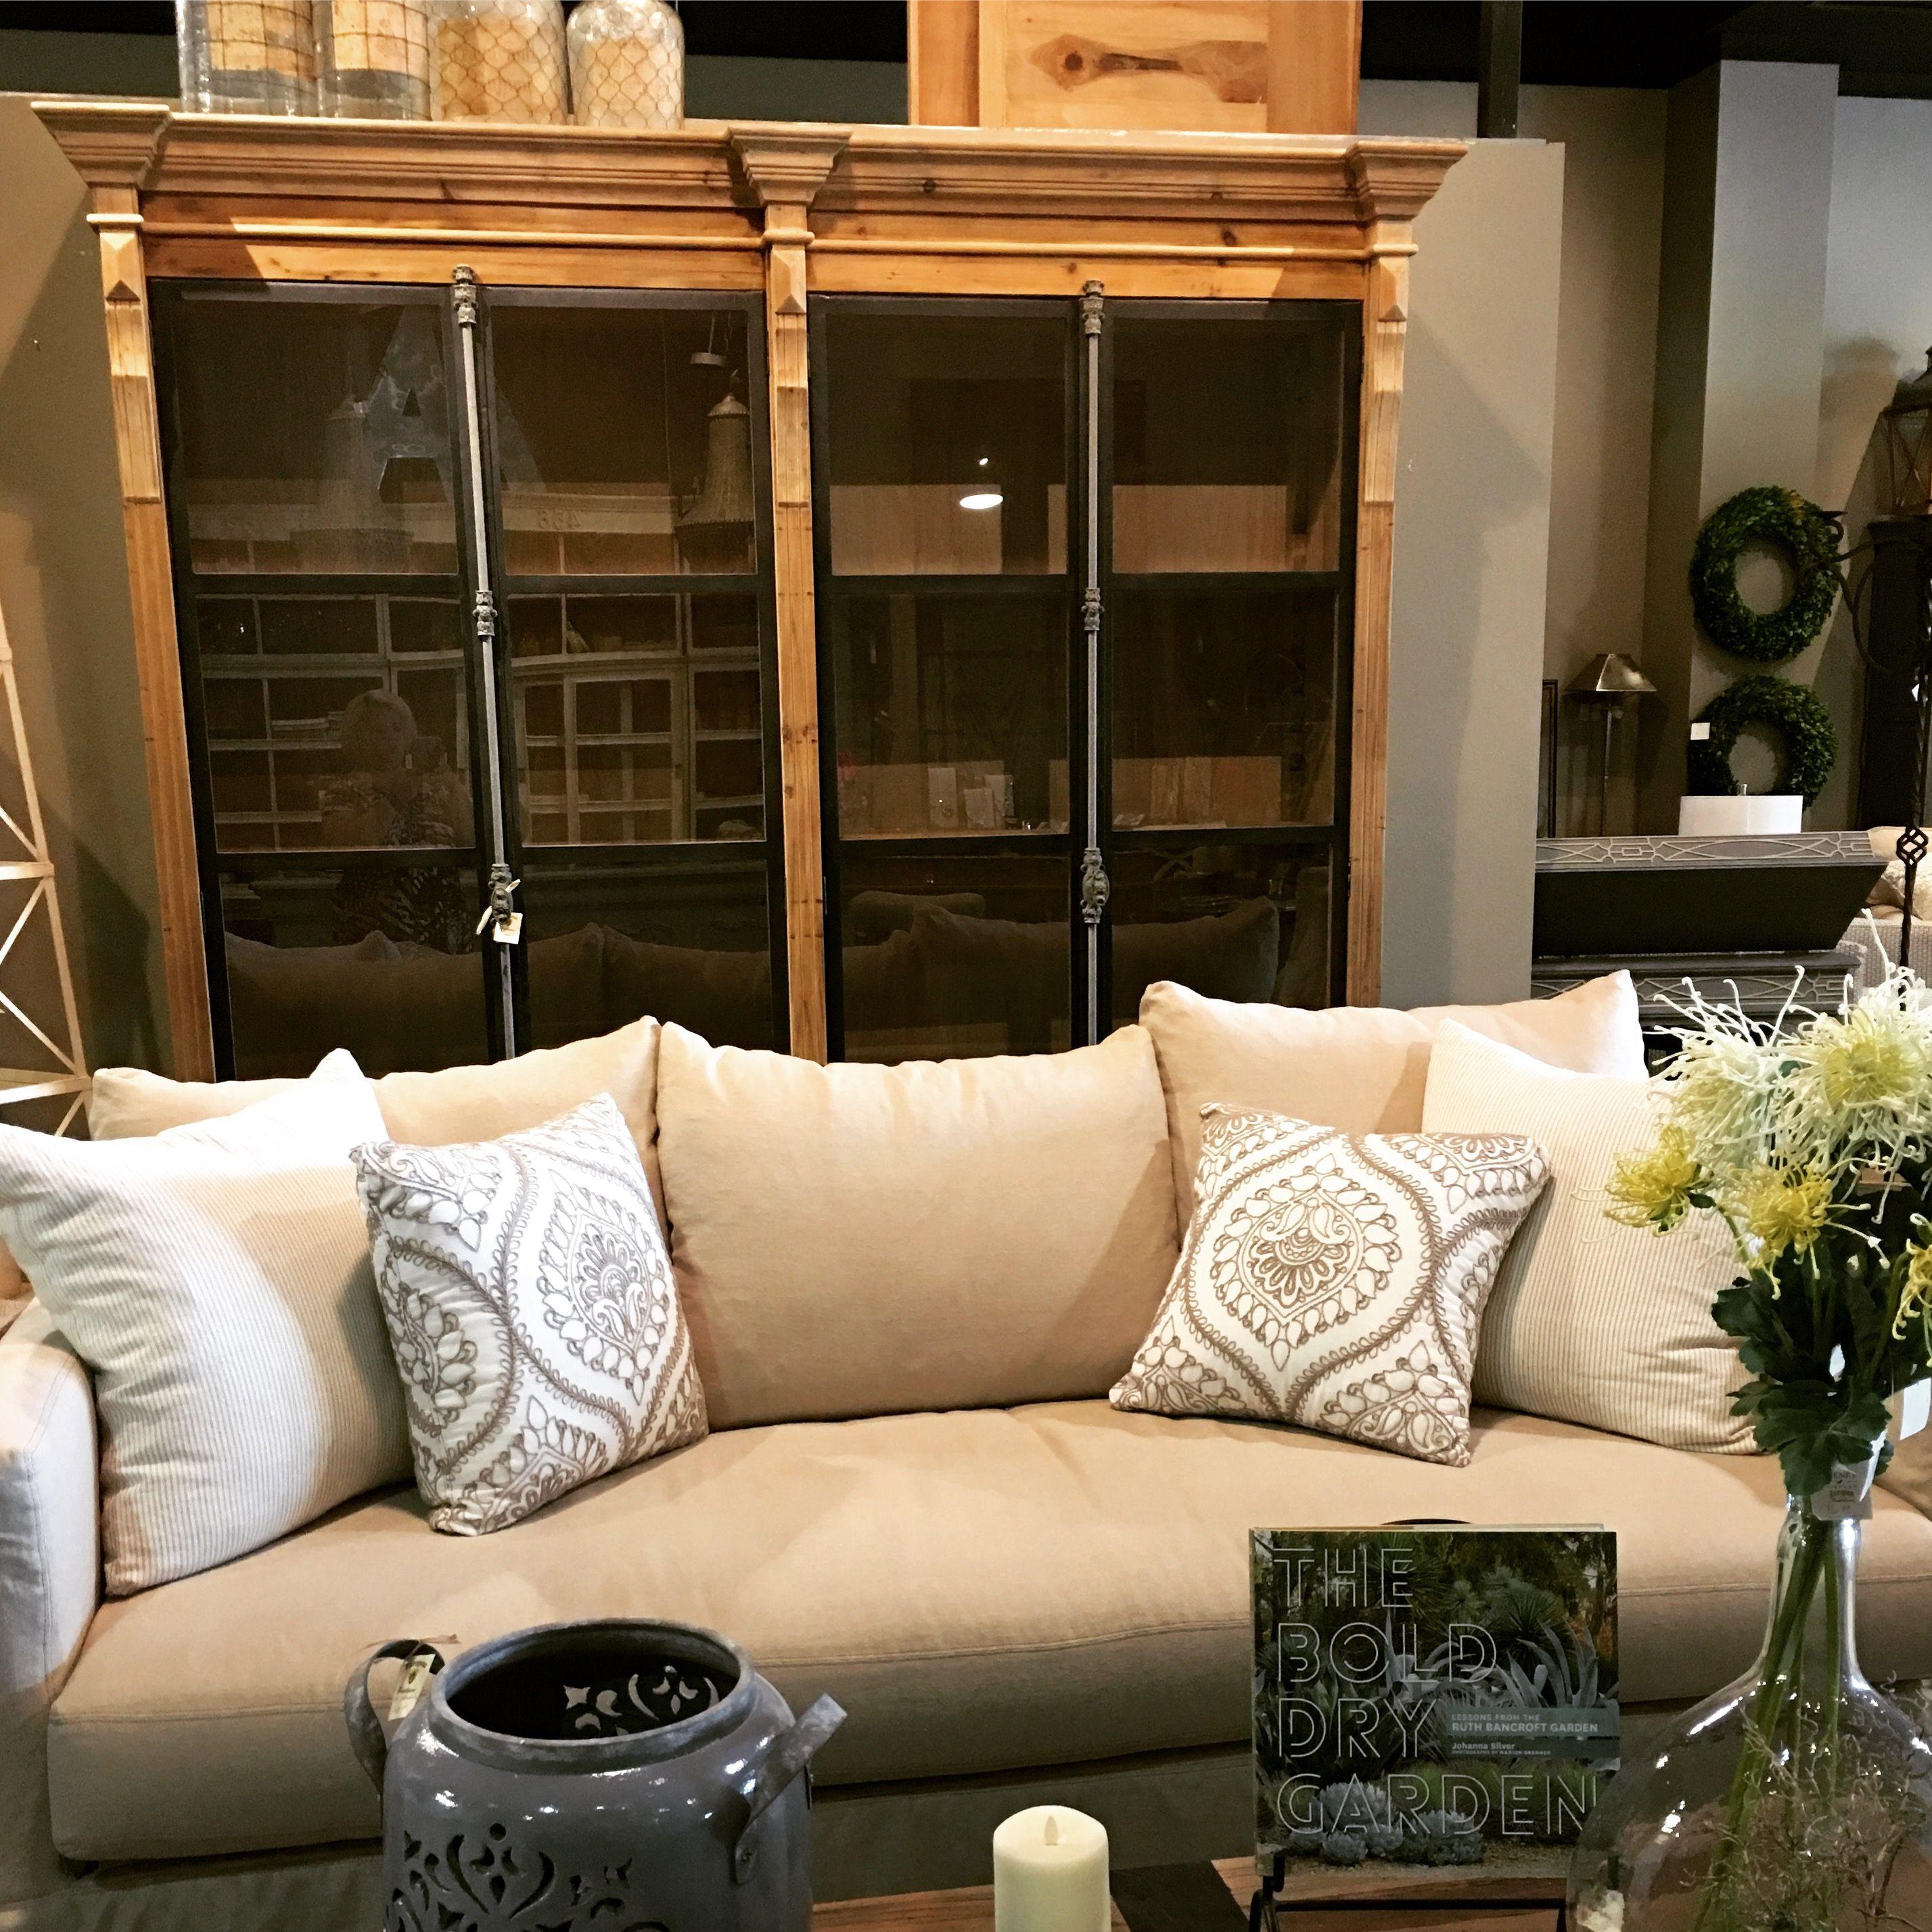 Superbe Stop By Our #Sarasota Furniture Warehouse At 6030 Clark Center Ave  #SarasotaFurniture #Sarasotainteriordesigns #SarsotaFl #coastalchic  #transitionaldesign